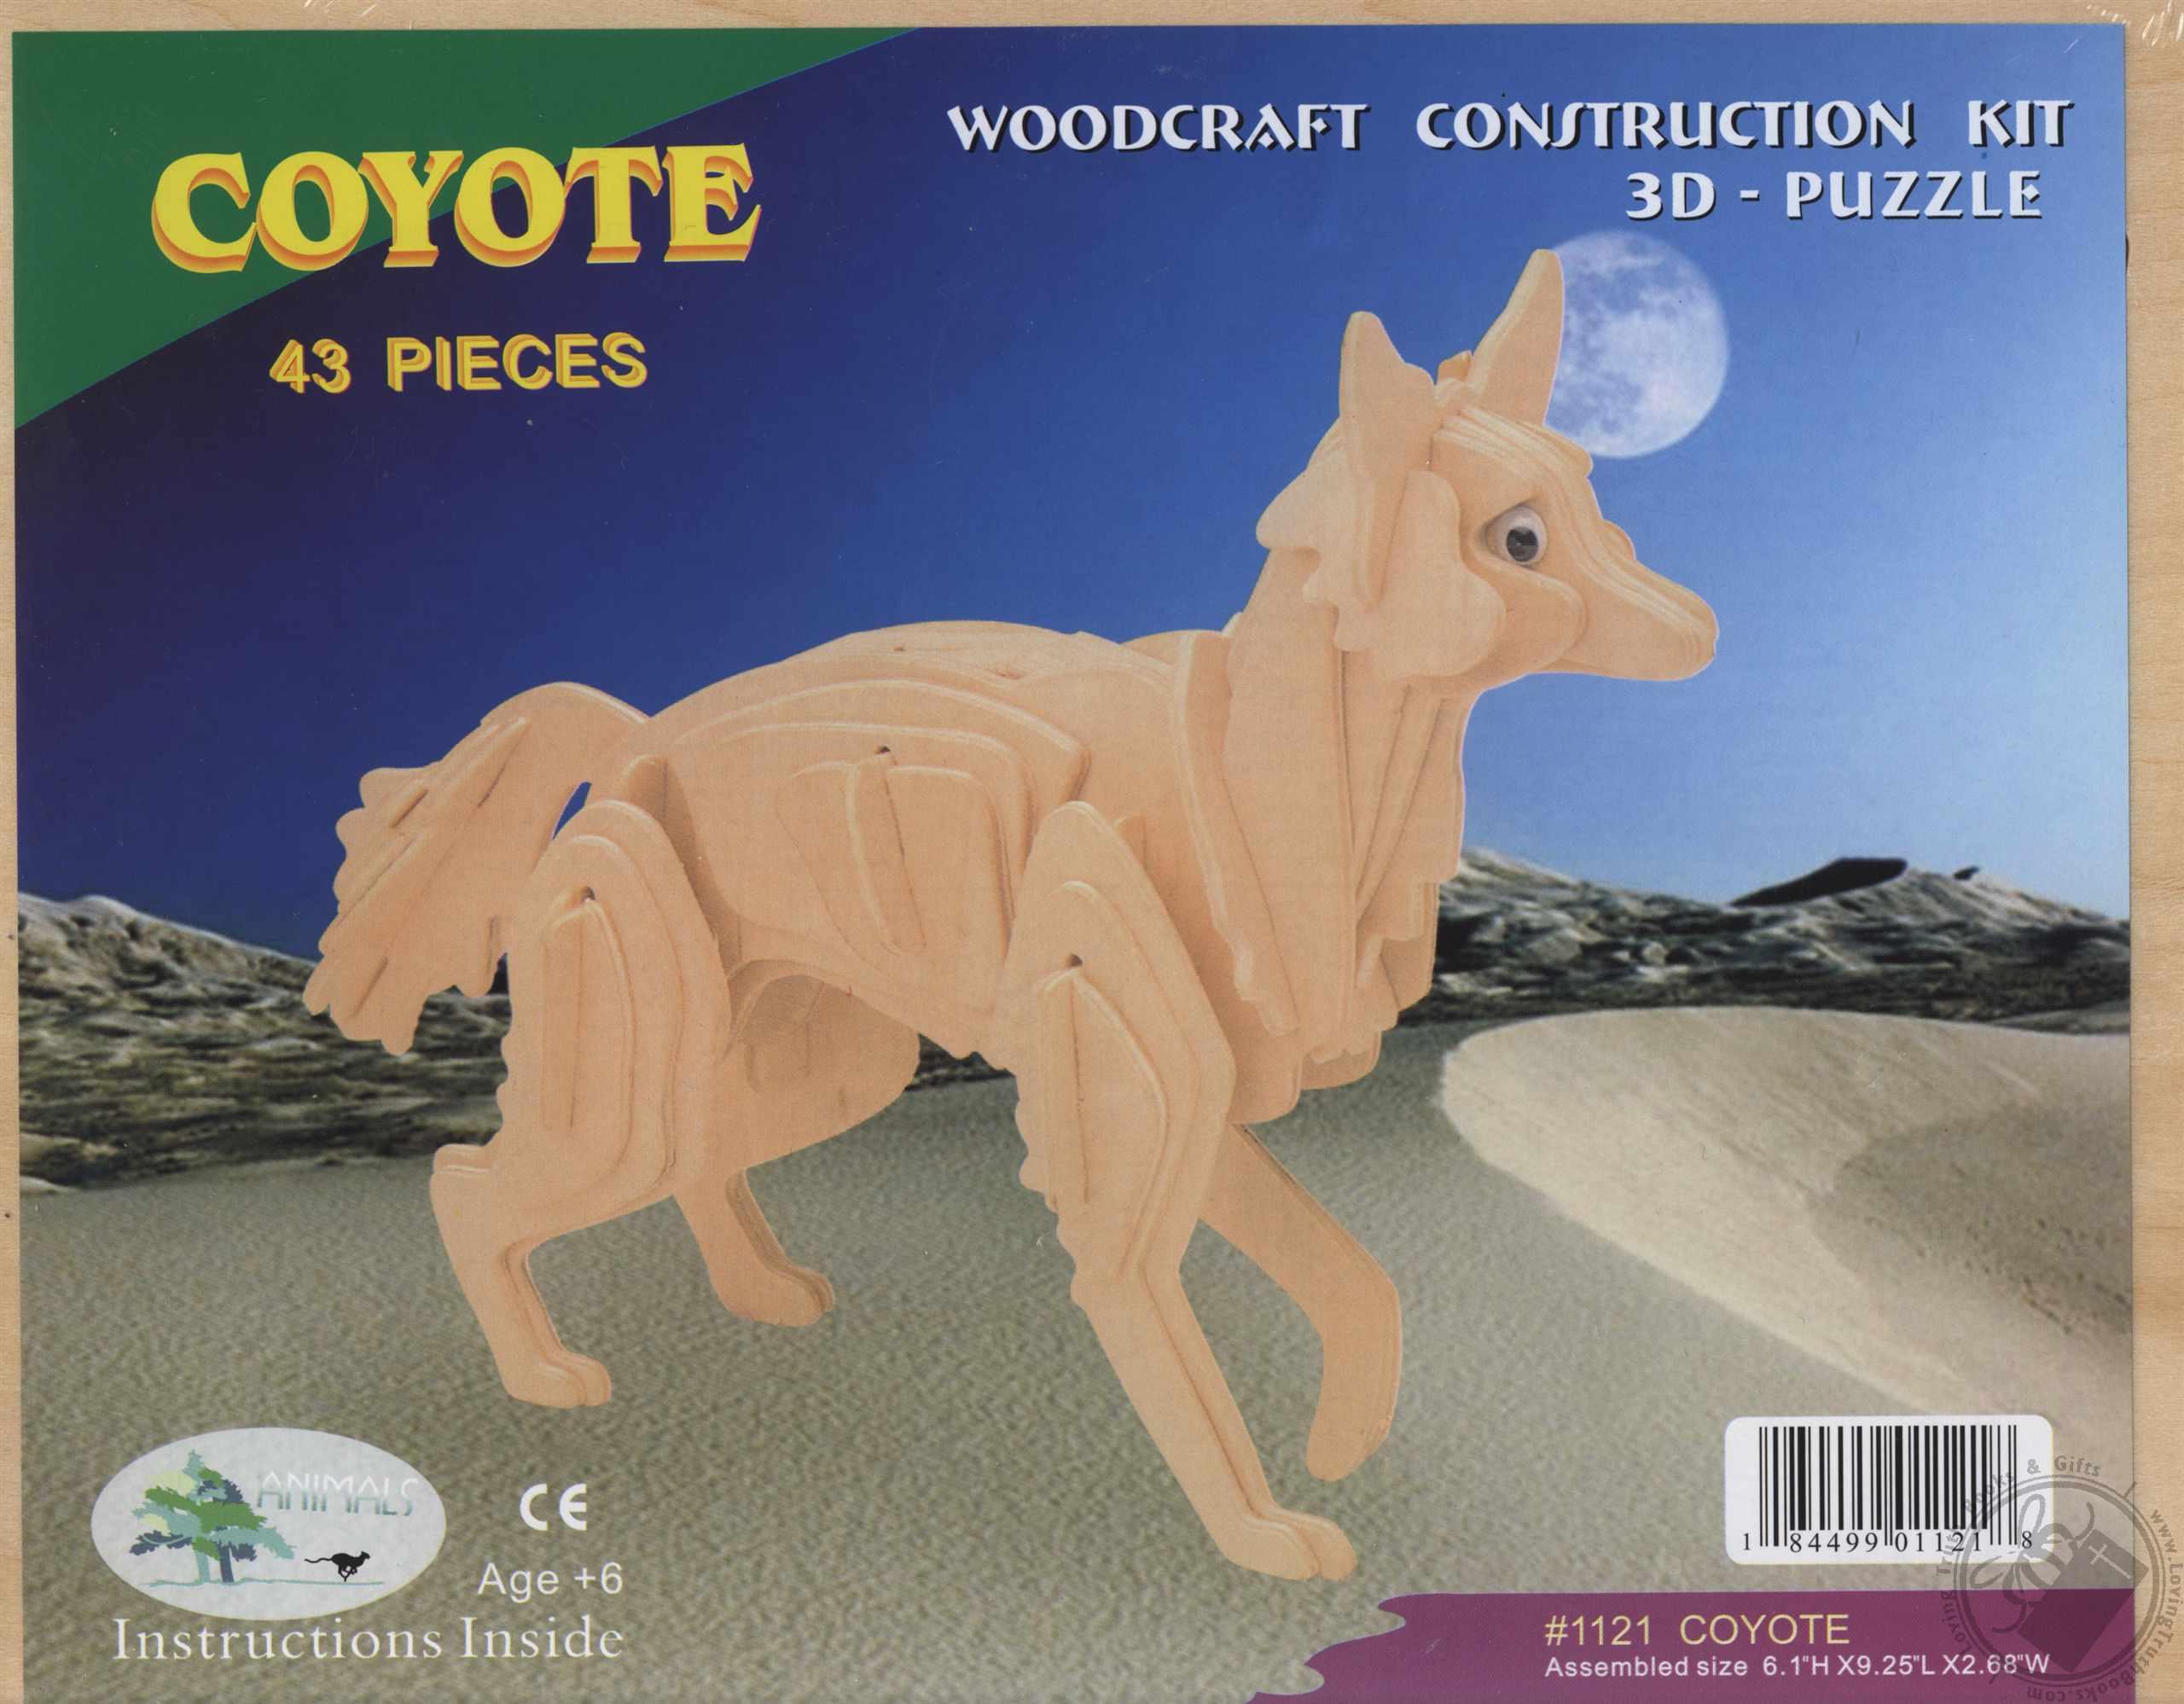 woodcraft construction kit инструкция